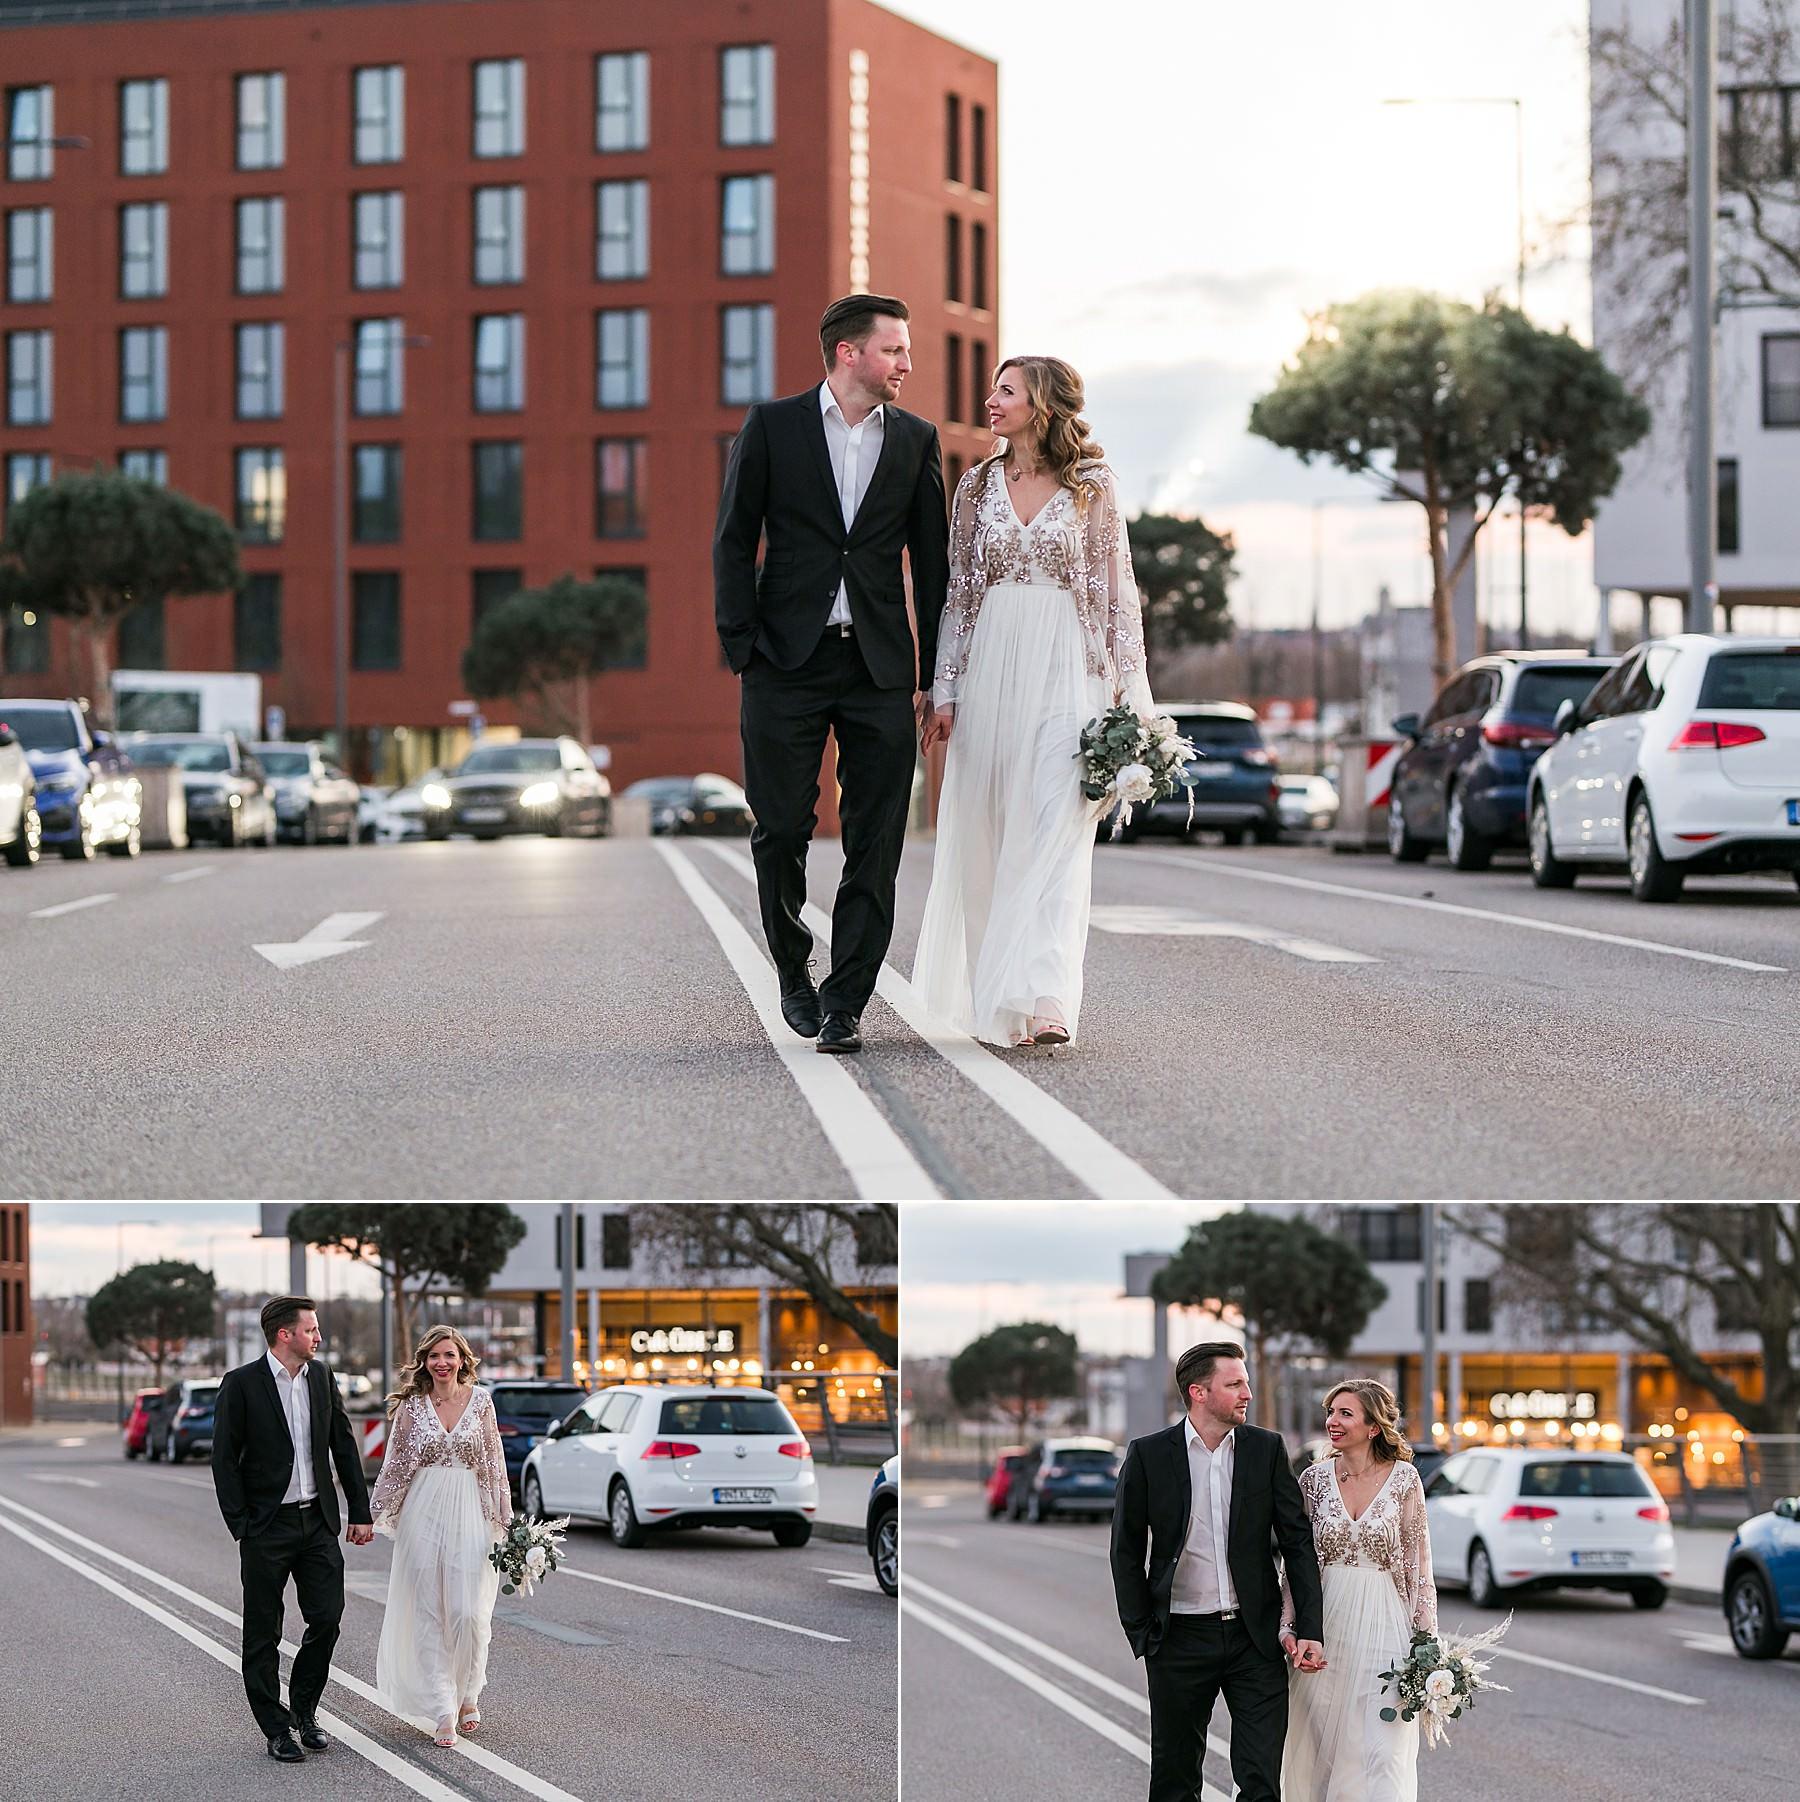 Brautpaarshooting in der Heilbronner City